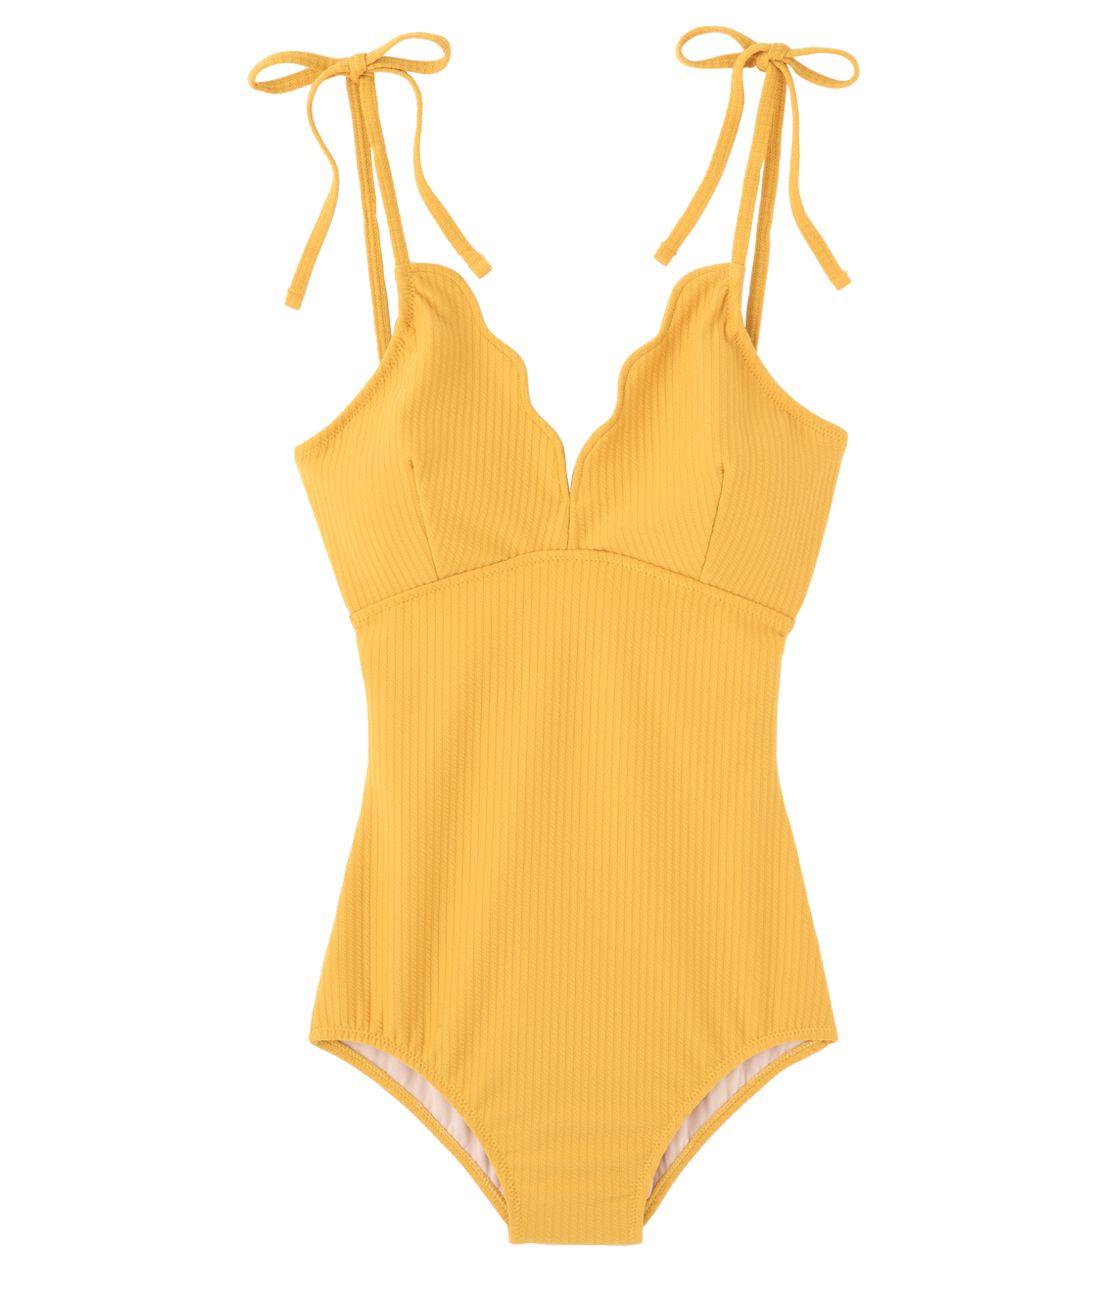 YM Ribusukarappu swimsuit